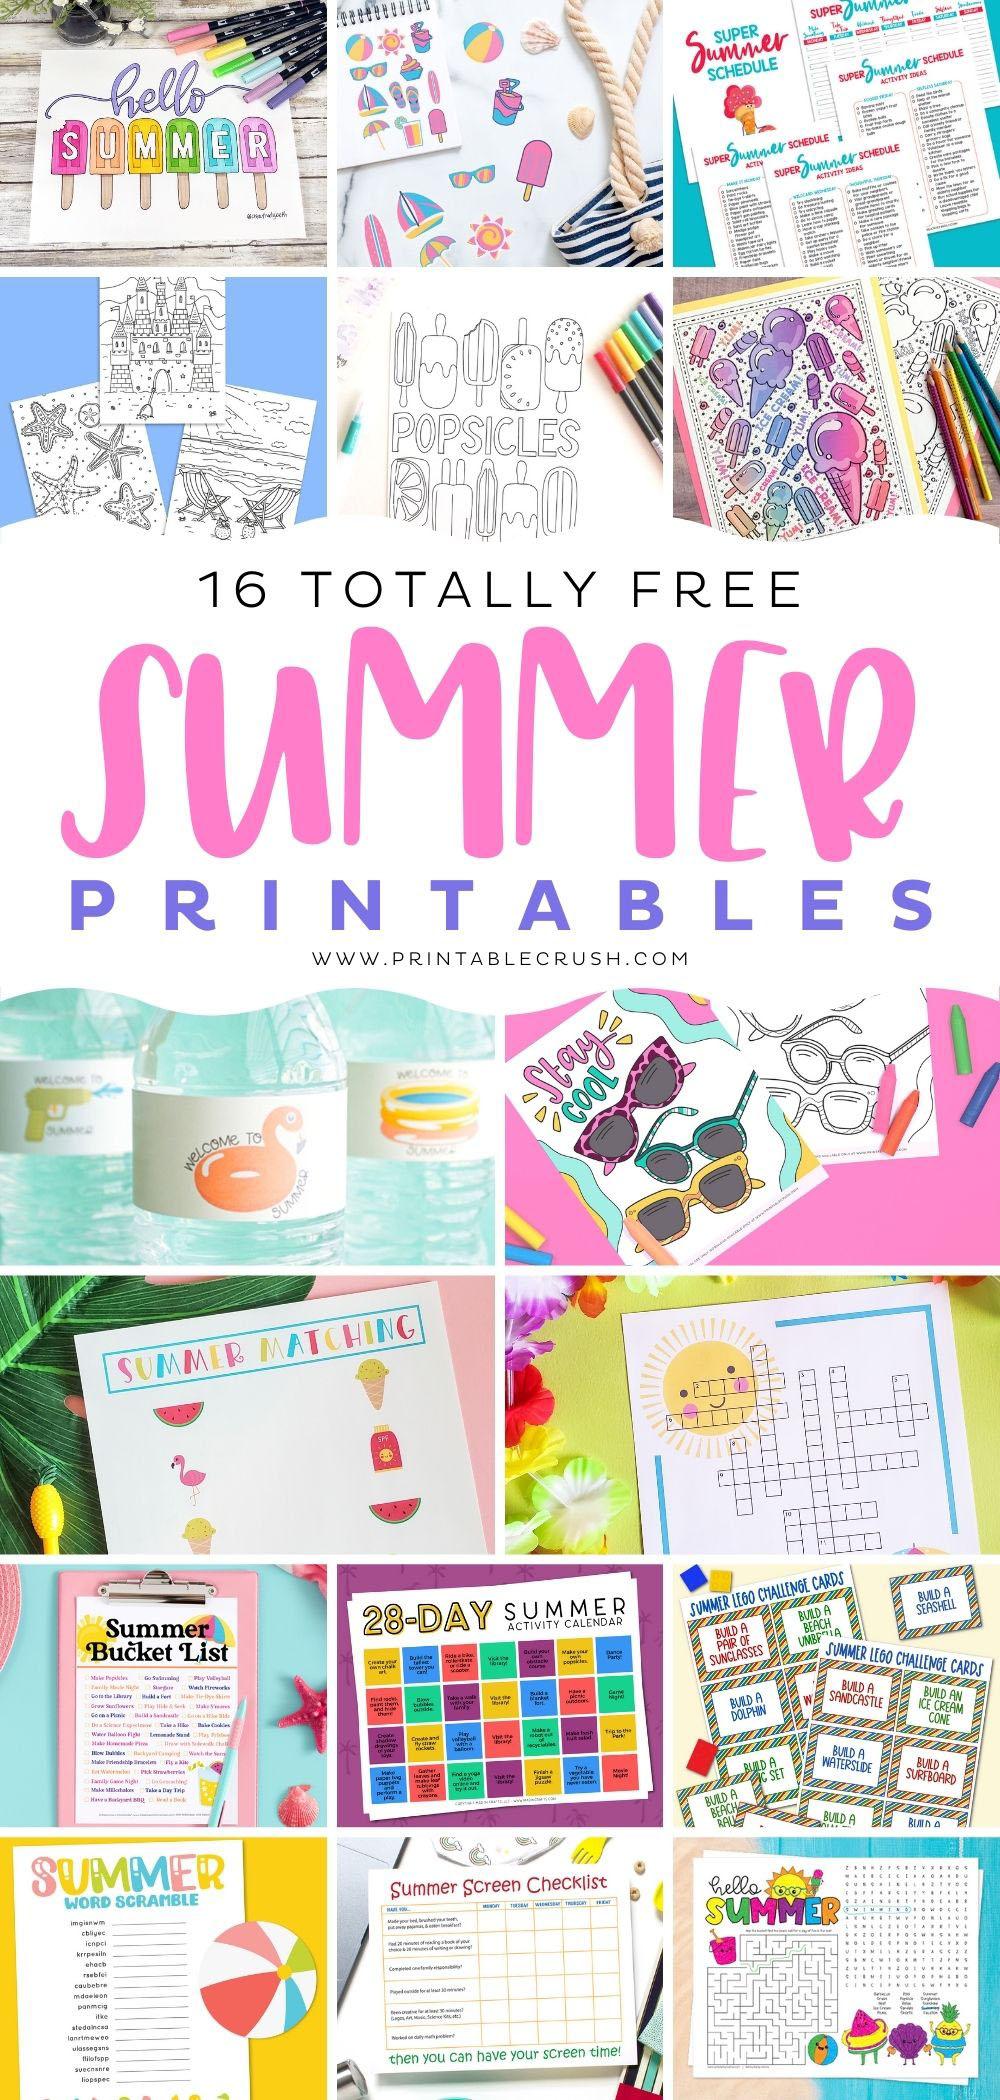 16 Totally Free Summer Printables - Printable Crush